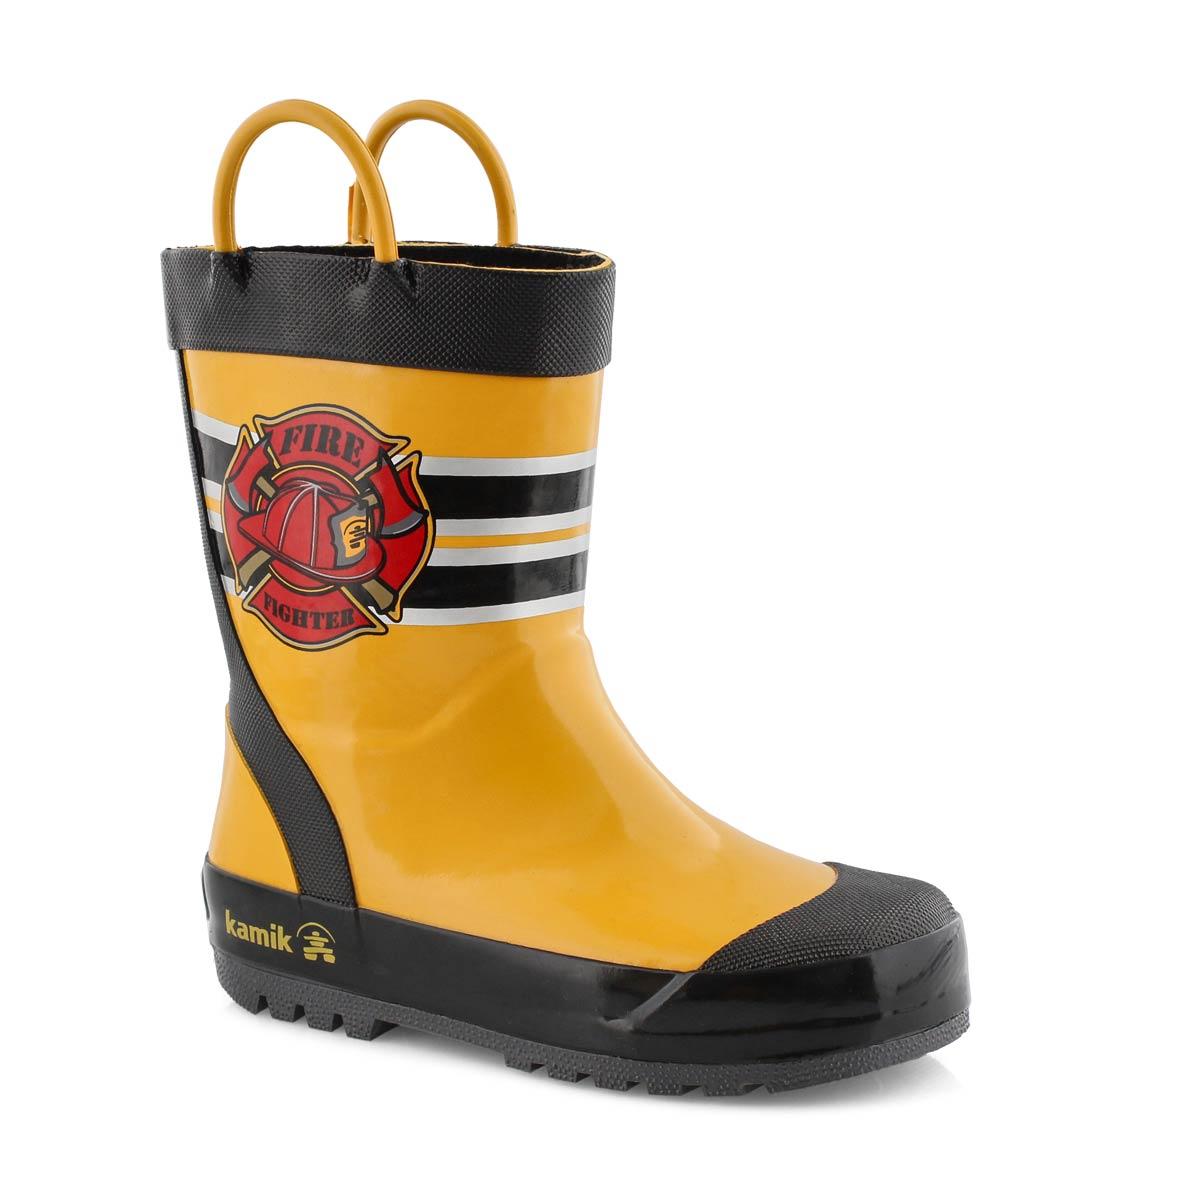 Bys Fireman yellow rain boot